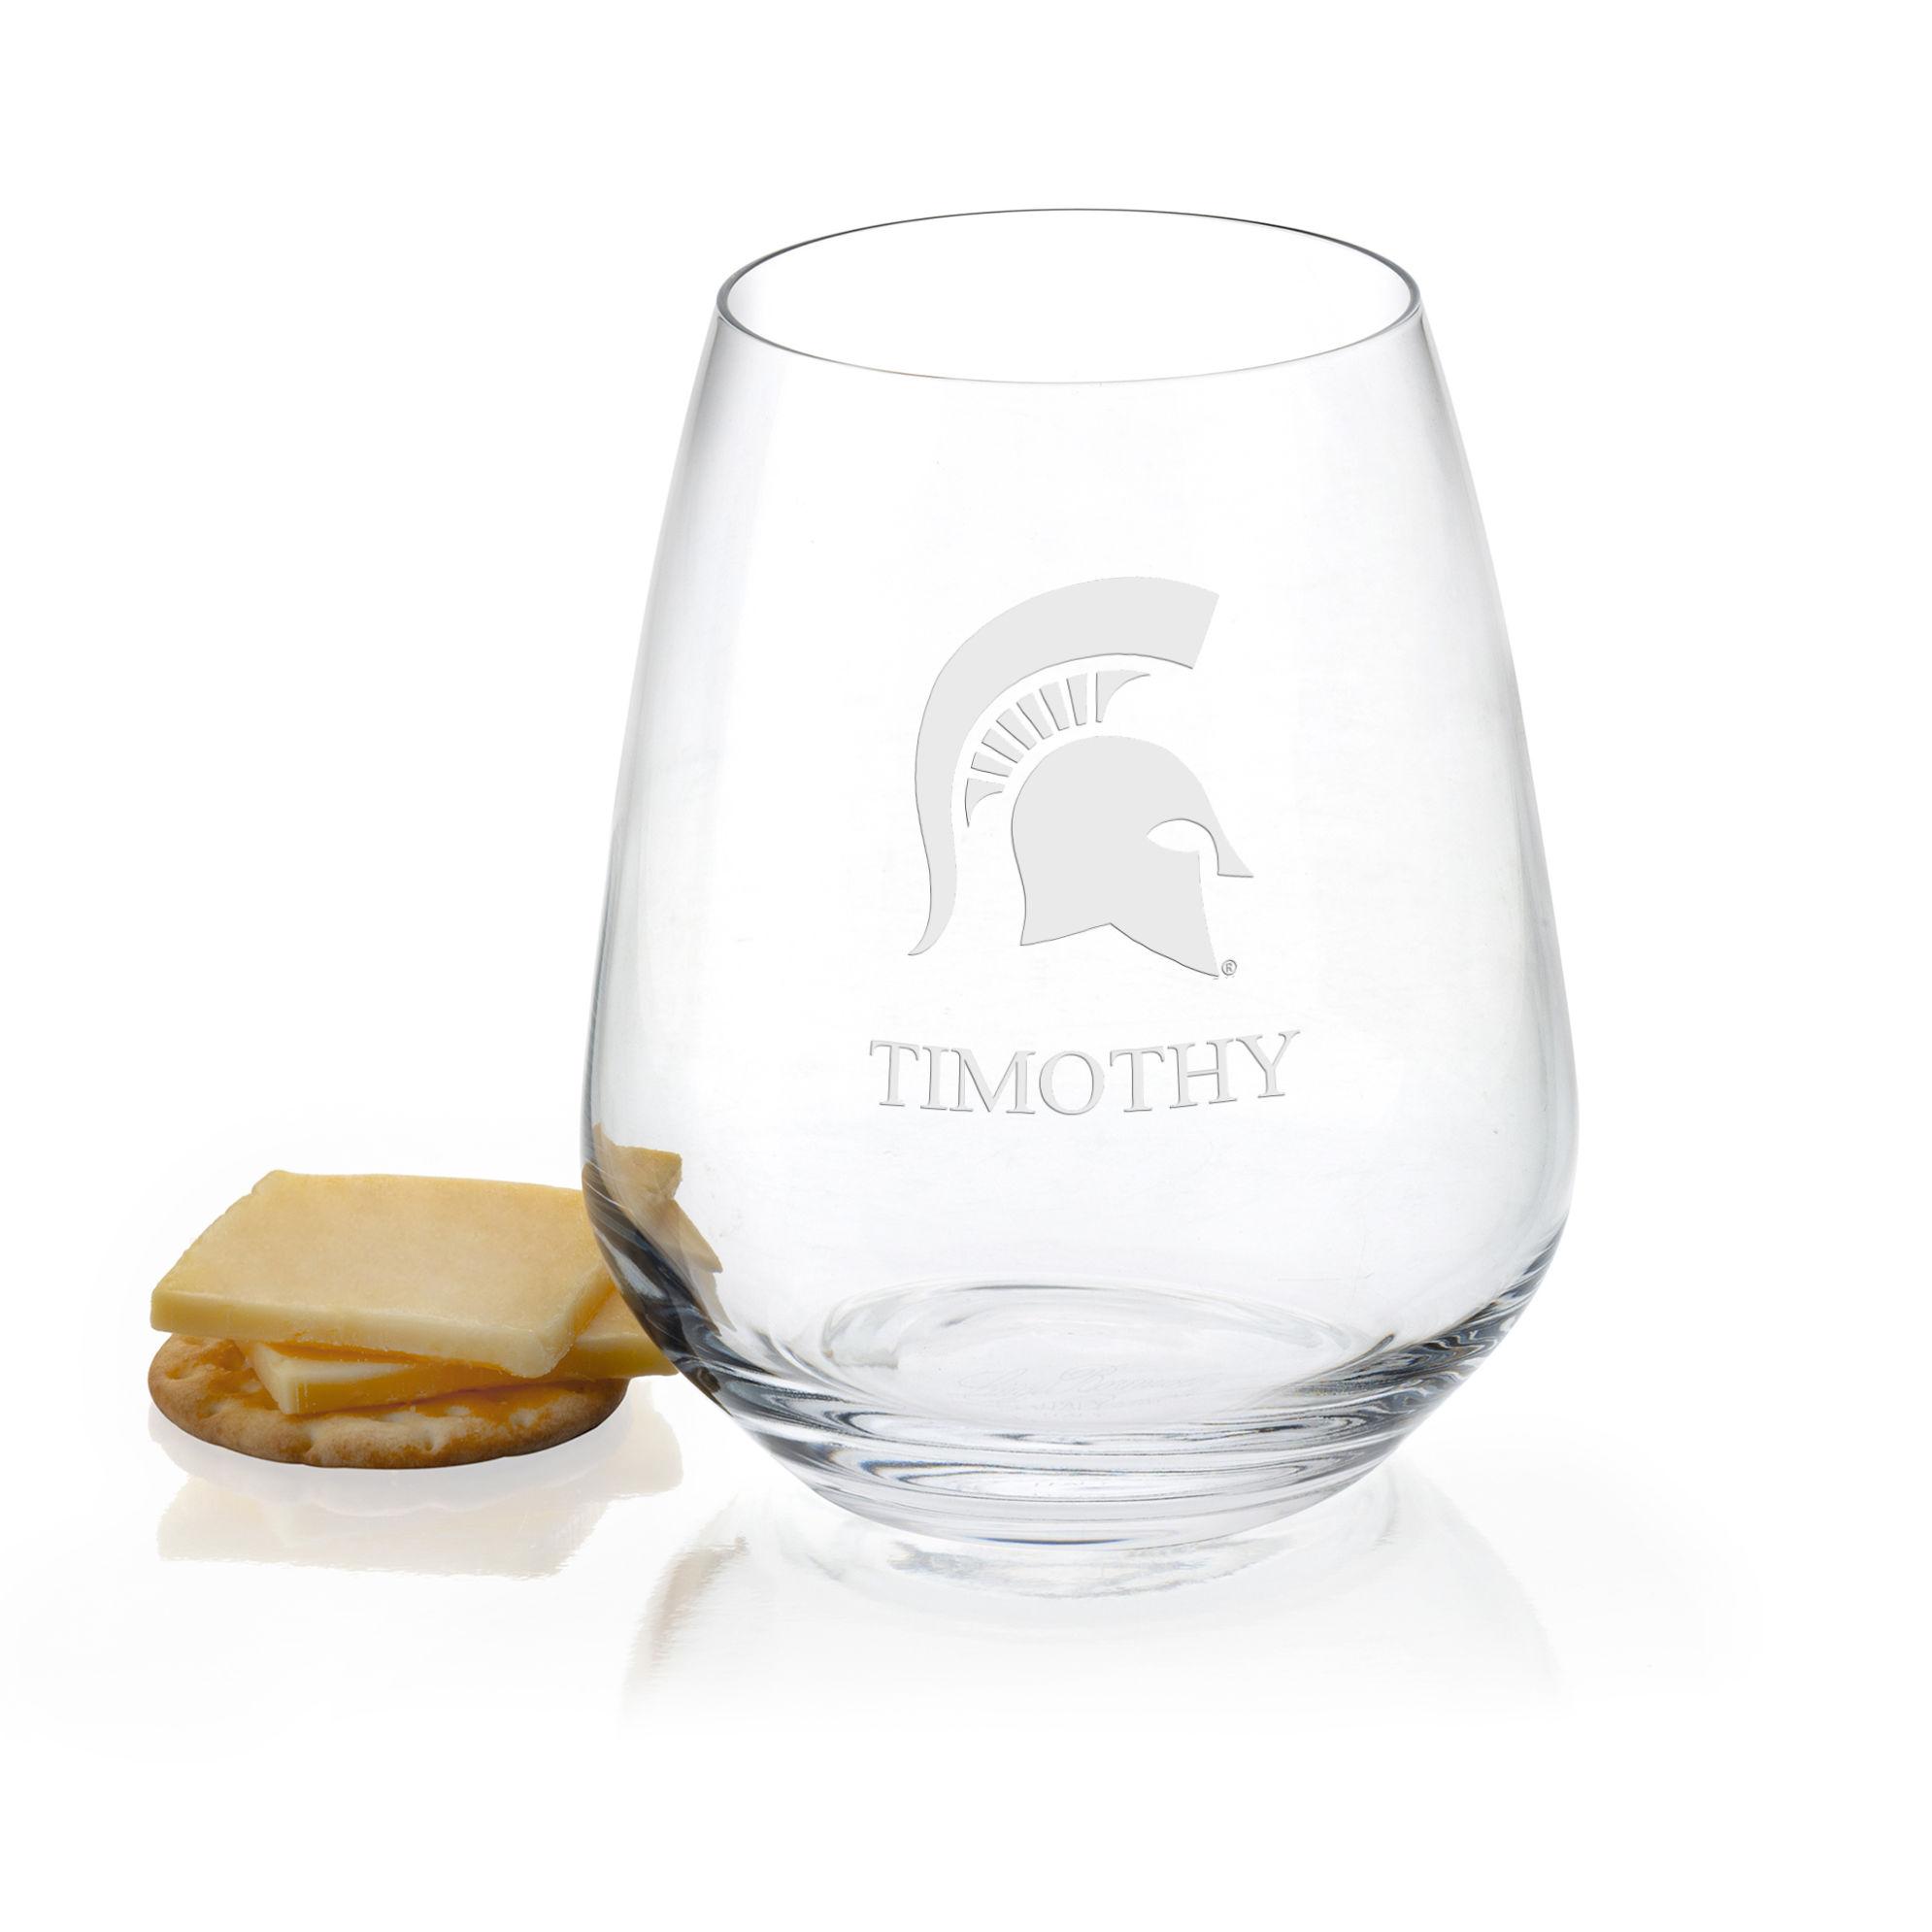 Michigan State University Stemless Wine Glasses - Set of 2